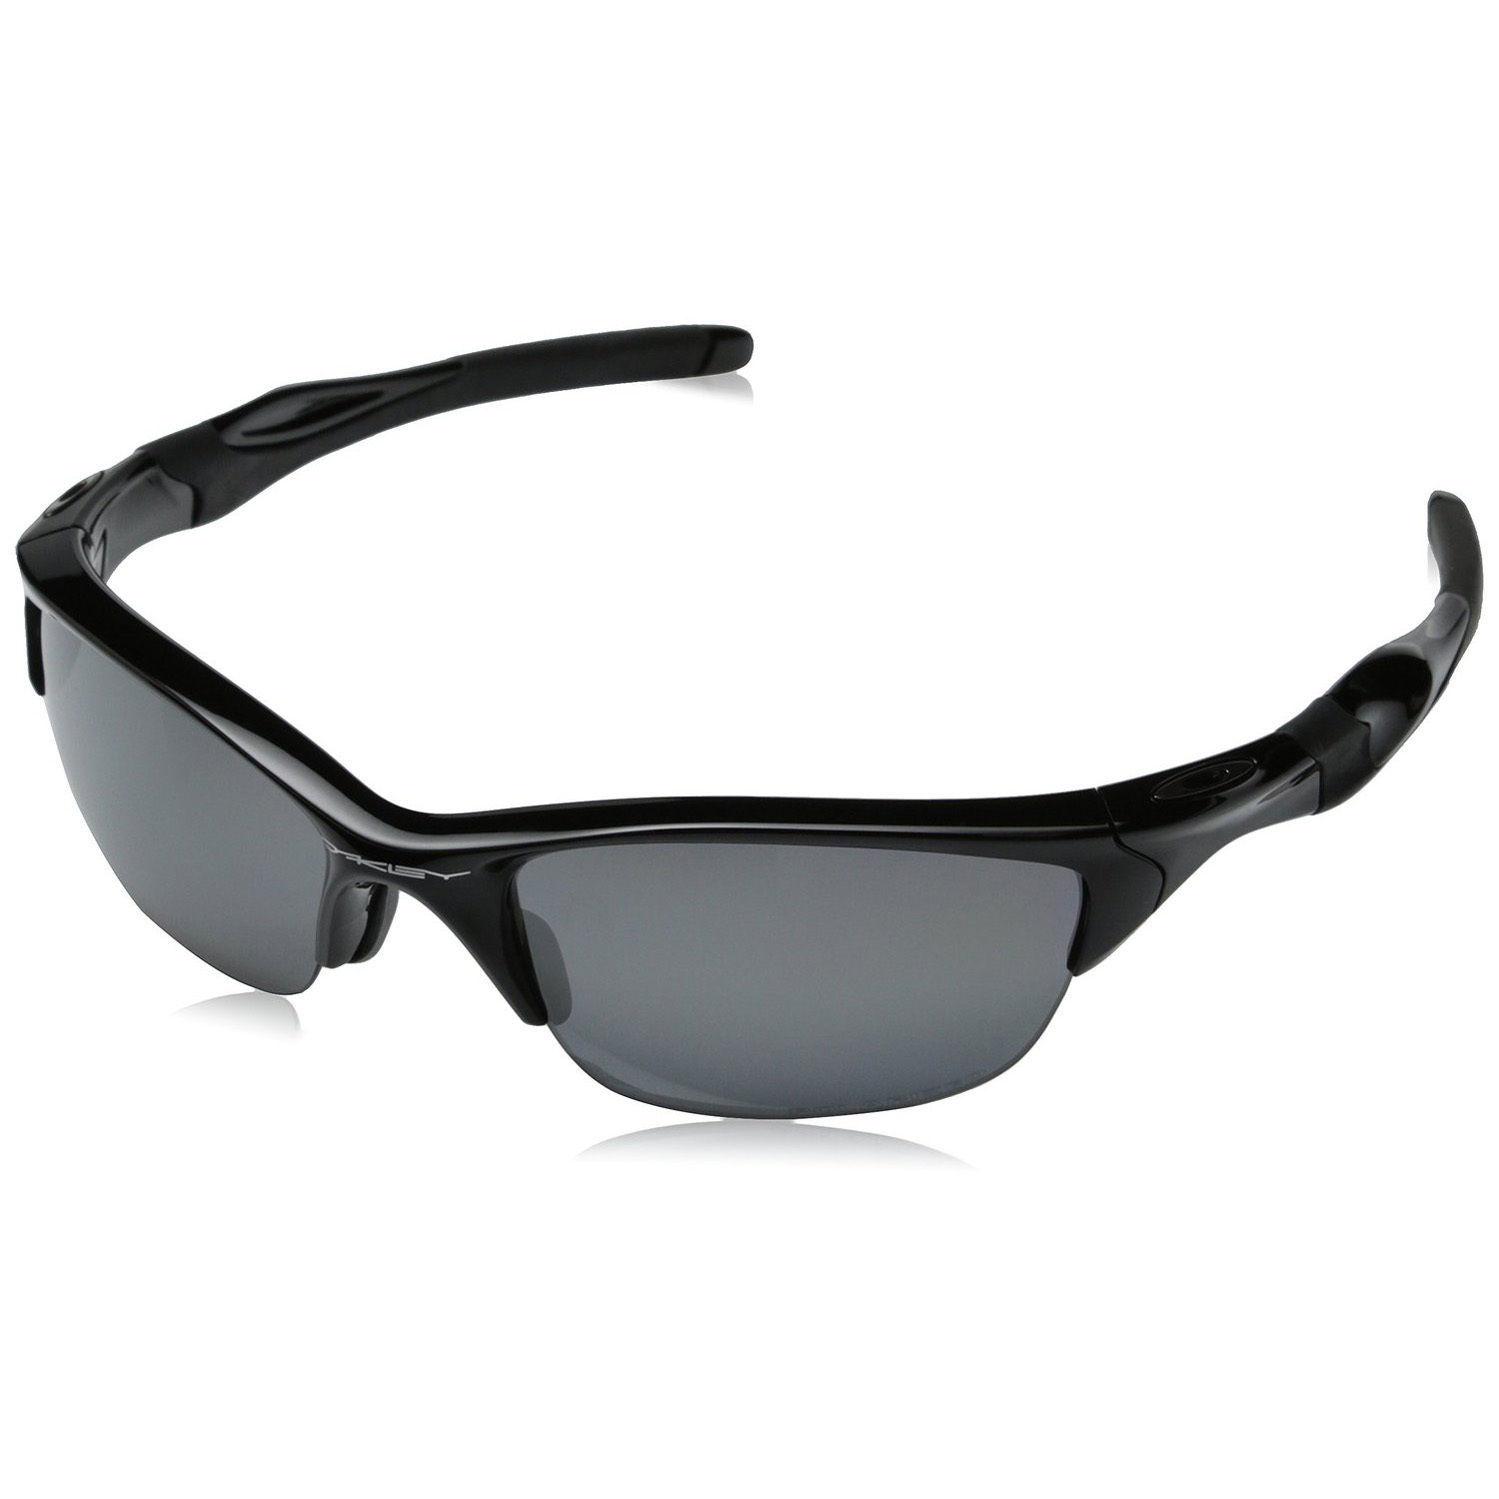 cf4c2164f54c4 S l1600. S l1600. Previous. Oakley Half Jacket 2.0 XL Men s Polarized  Sunglasses Black Frame Iridium Lens